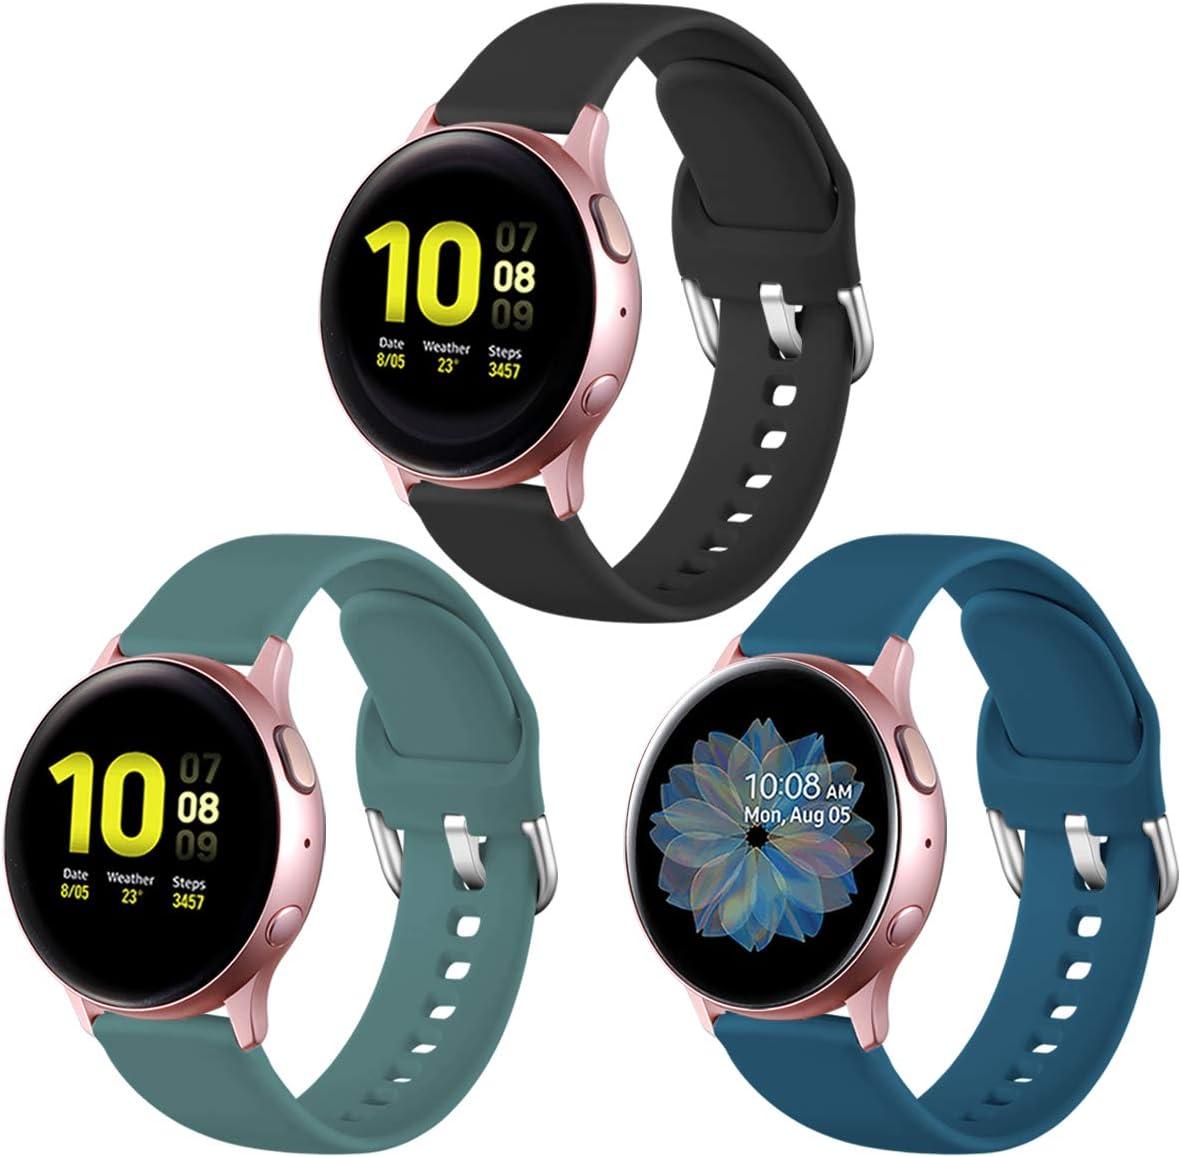 Malla Para Galaxy Watch Active/active2 Small Pack 3 (8C76)